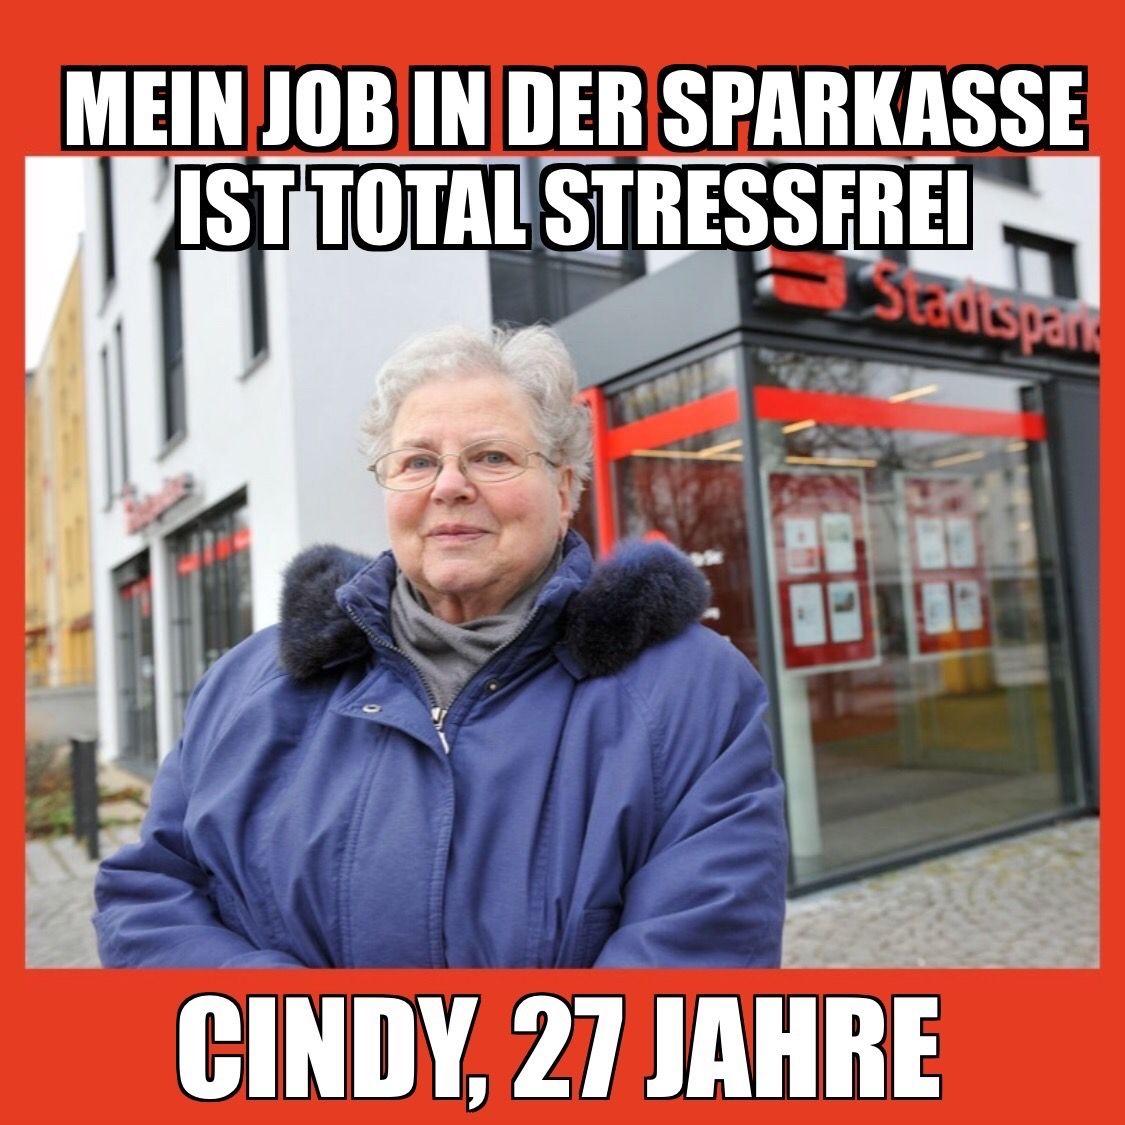 Mein Job In Der Sparkasse Ist Total Stressfrei Memes Humor Meme Lustig Stress